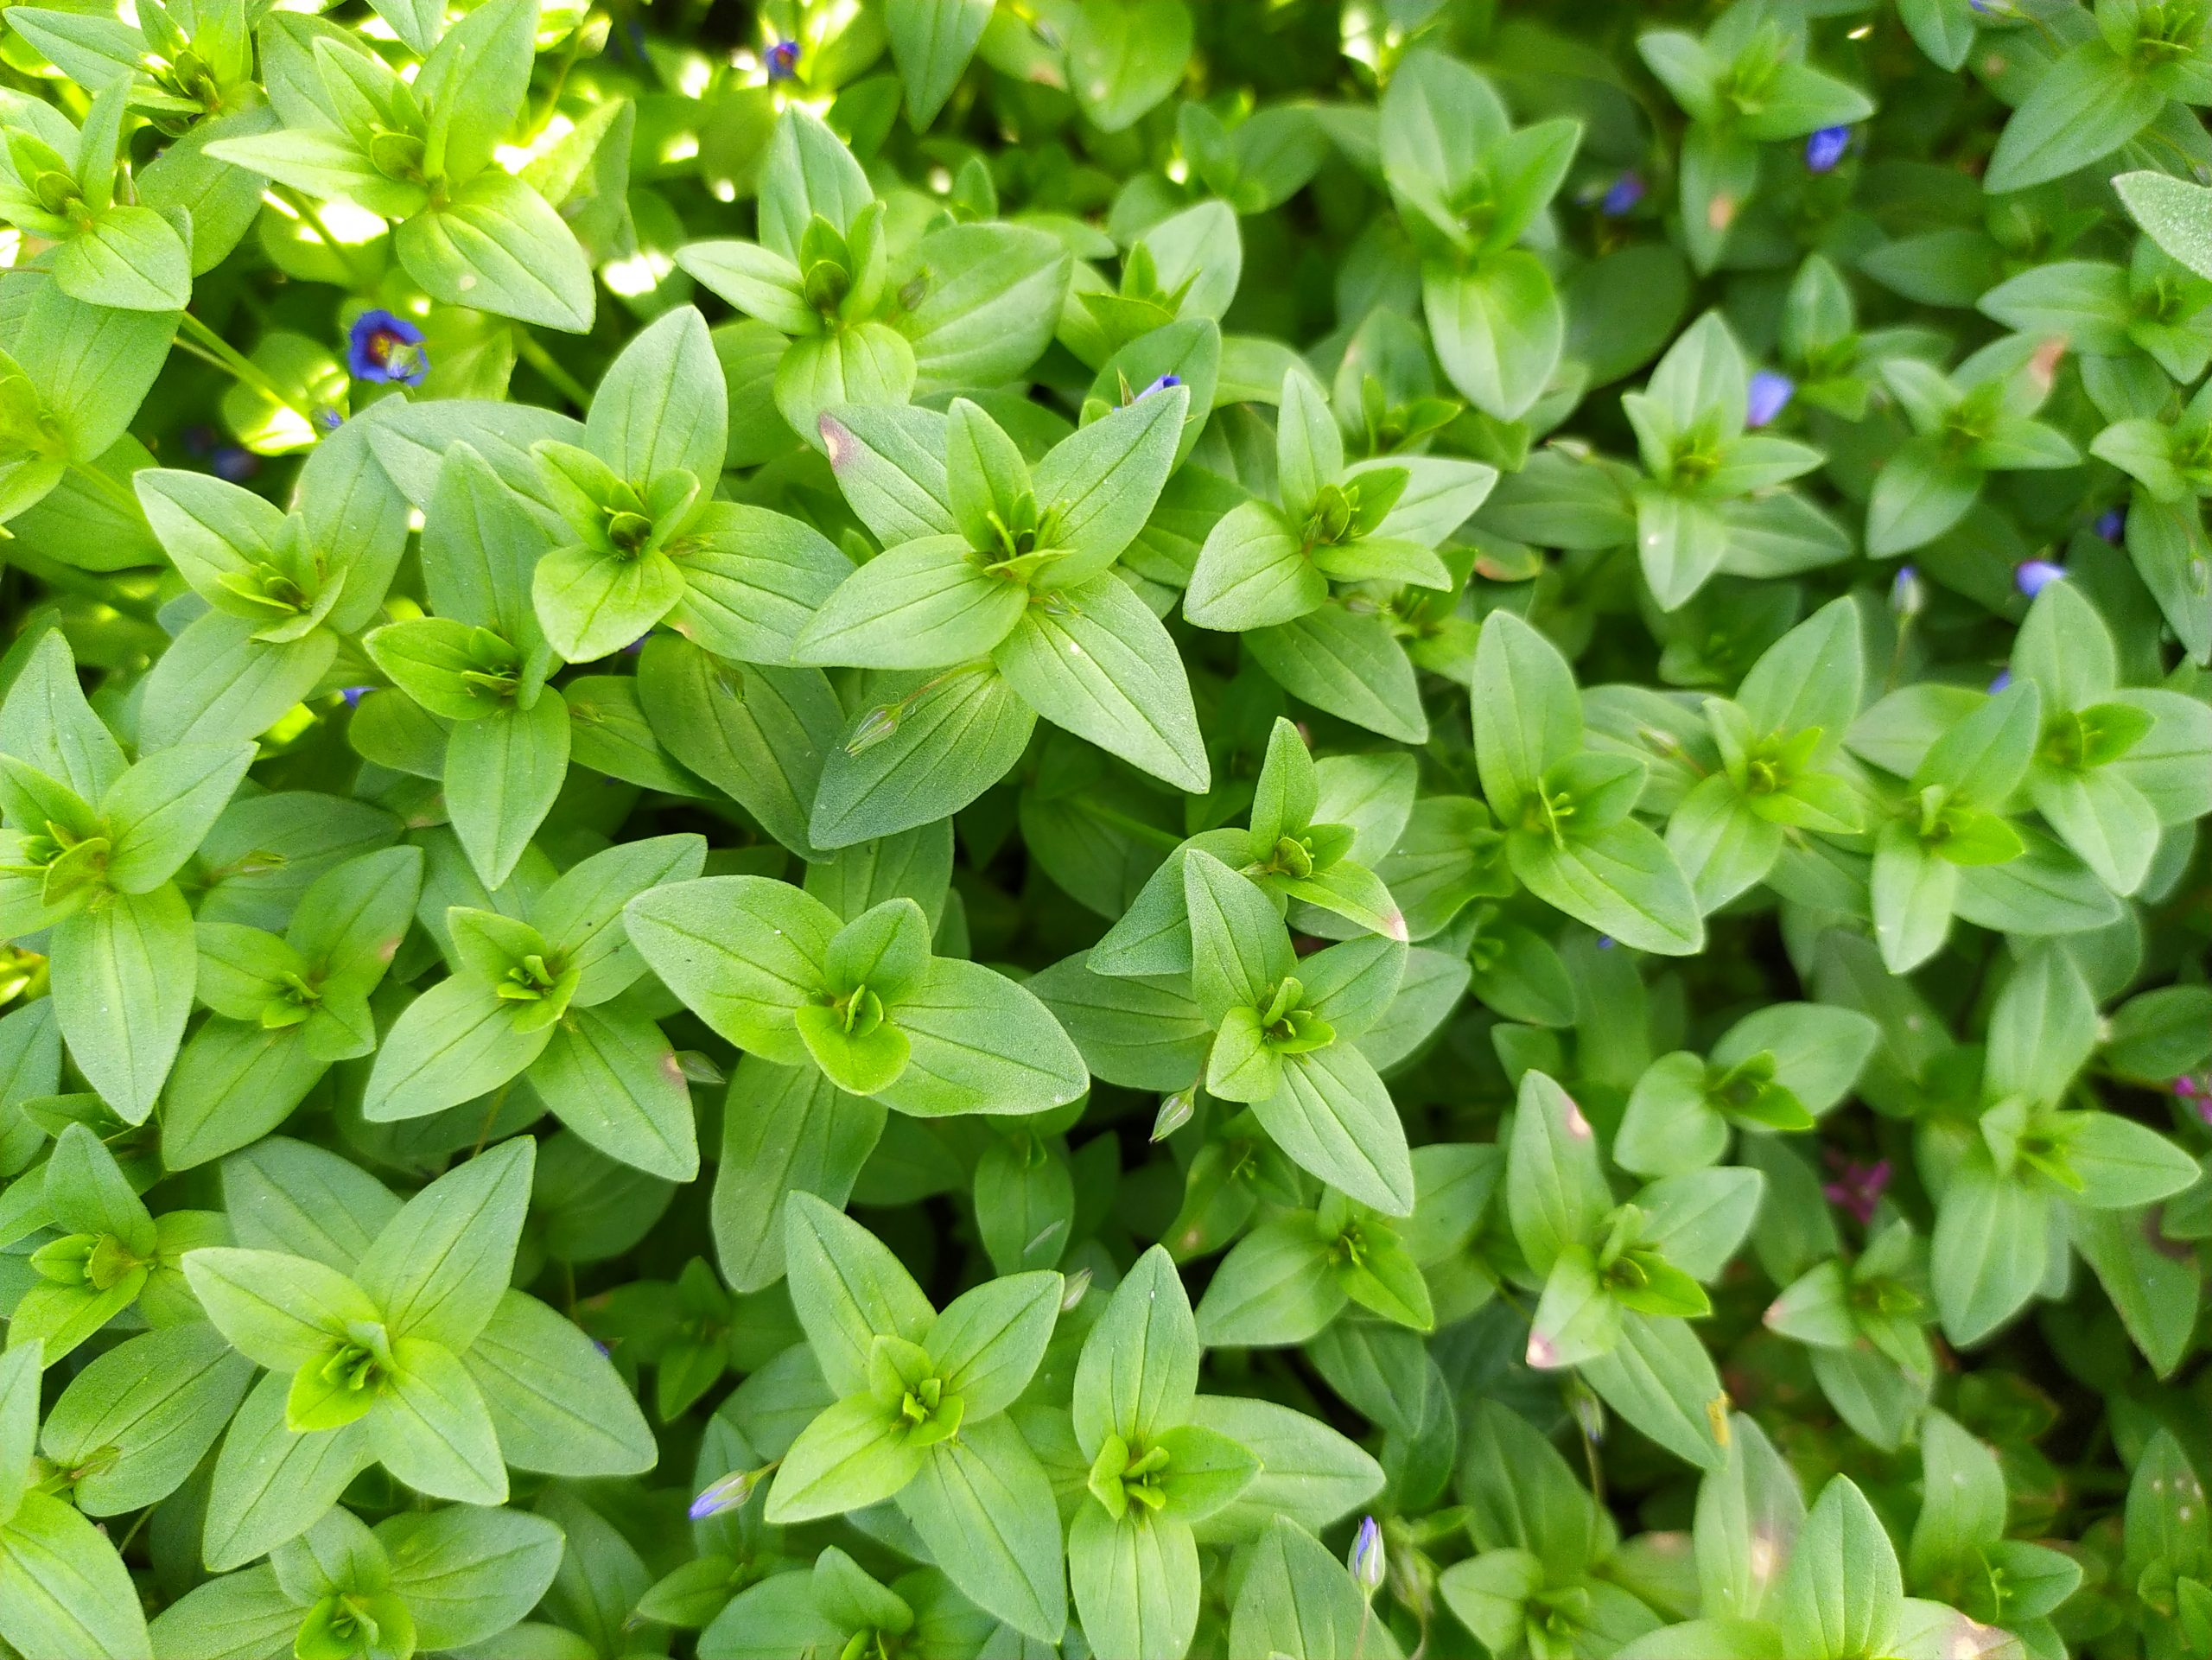 Small multiple plants